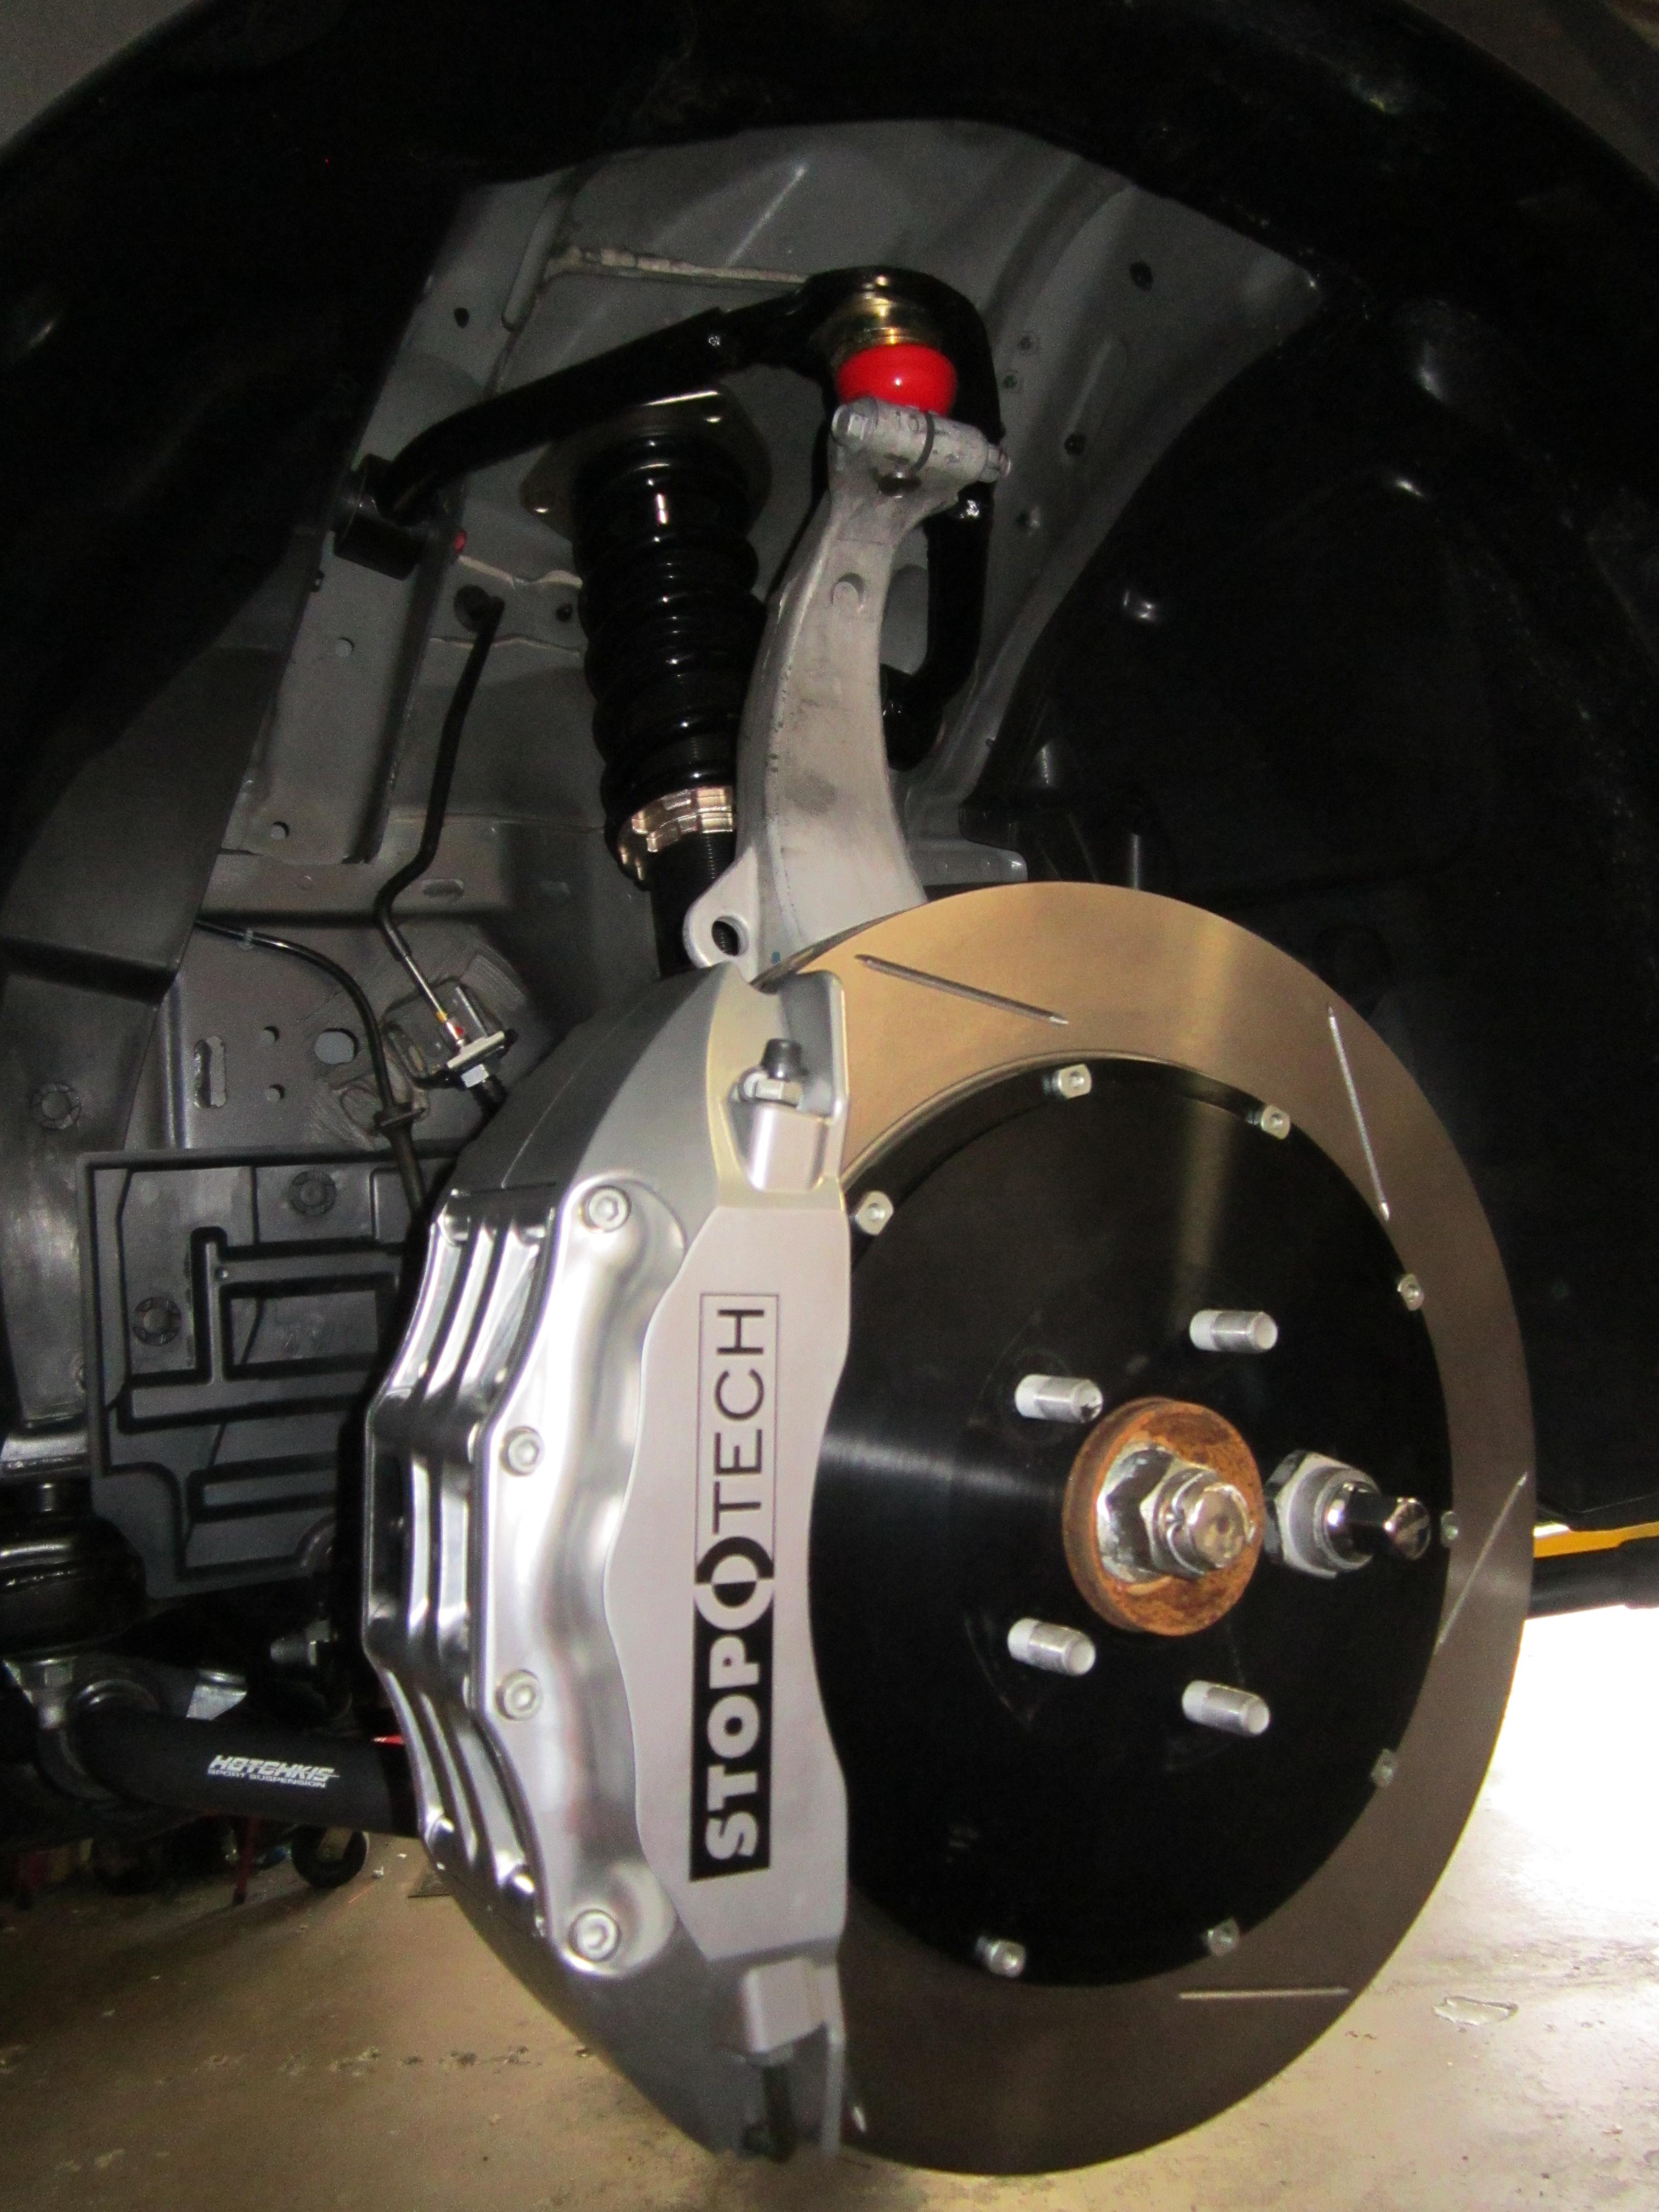 Z Car Blog 187 Post Topic 187 Twin Turbo Family Hauler Scott